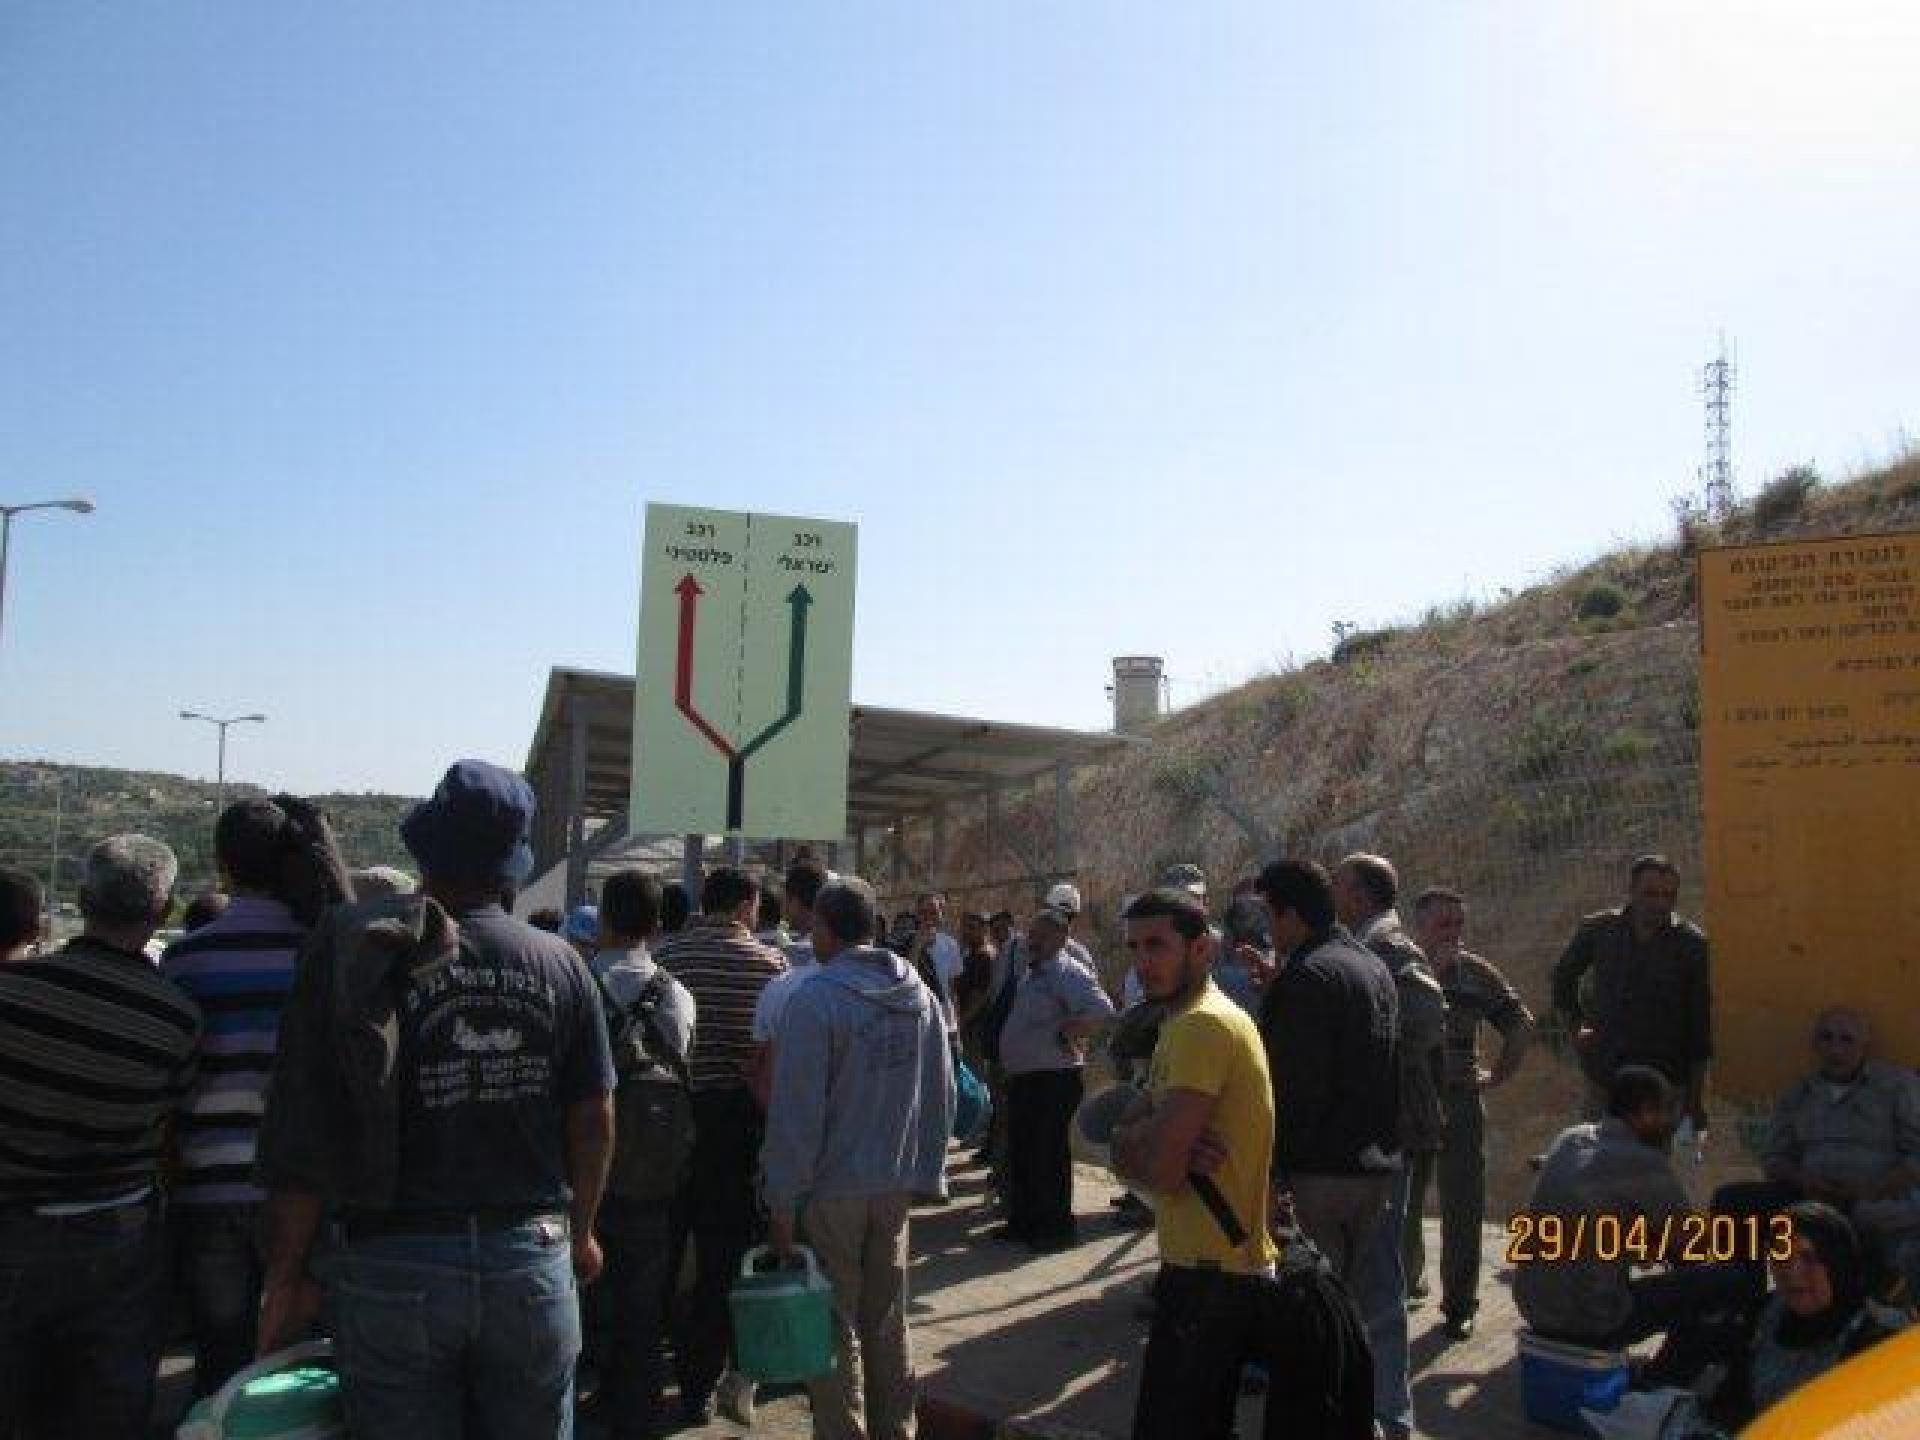 Barta'a/Reikhan checkpoint 29.04.13